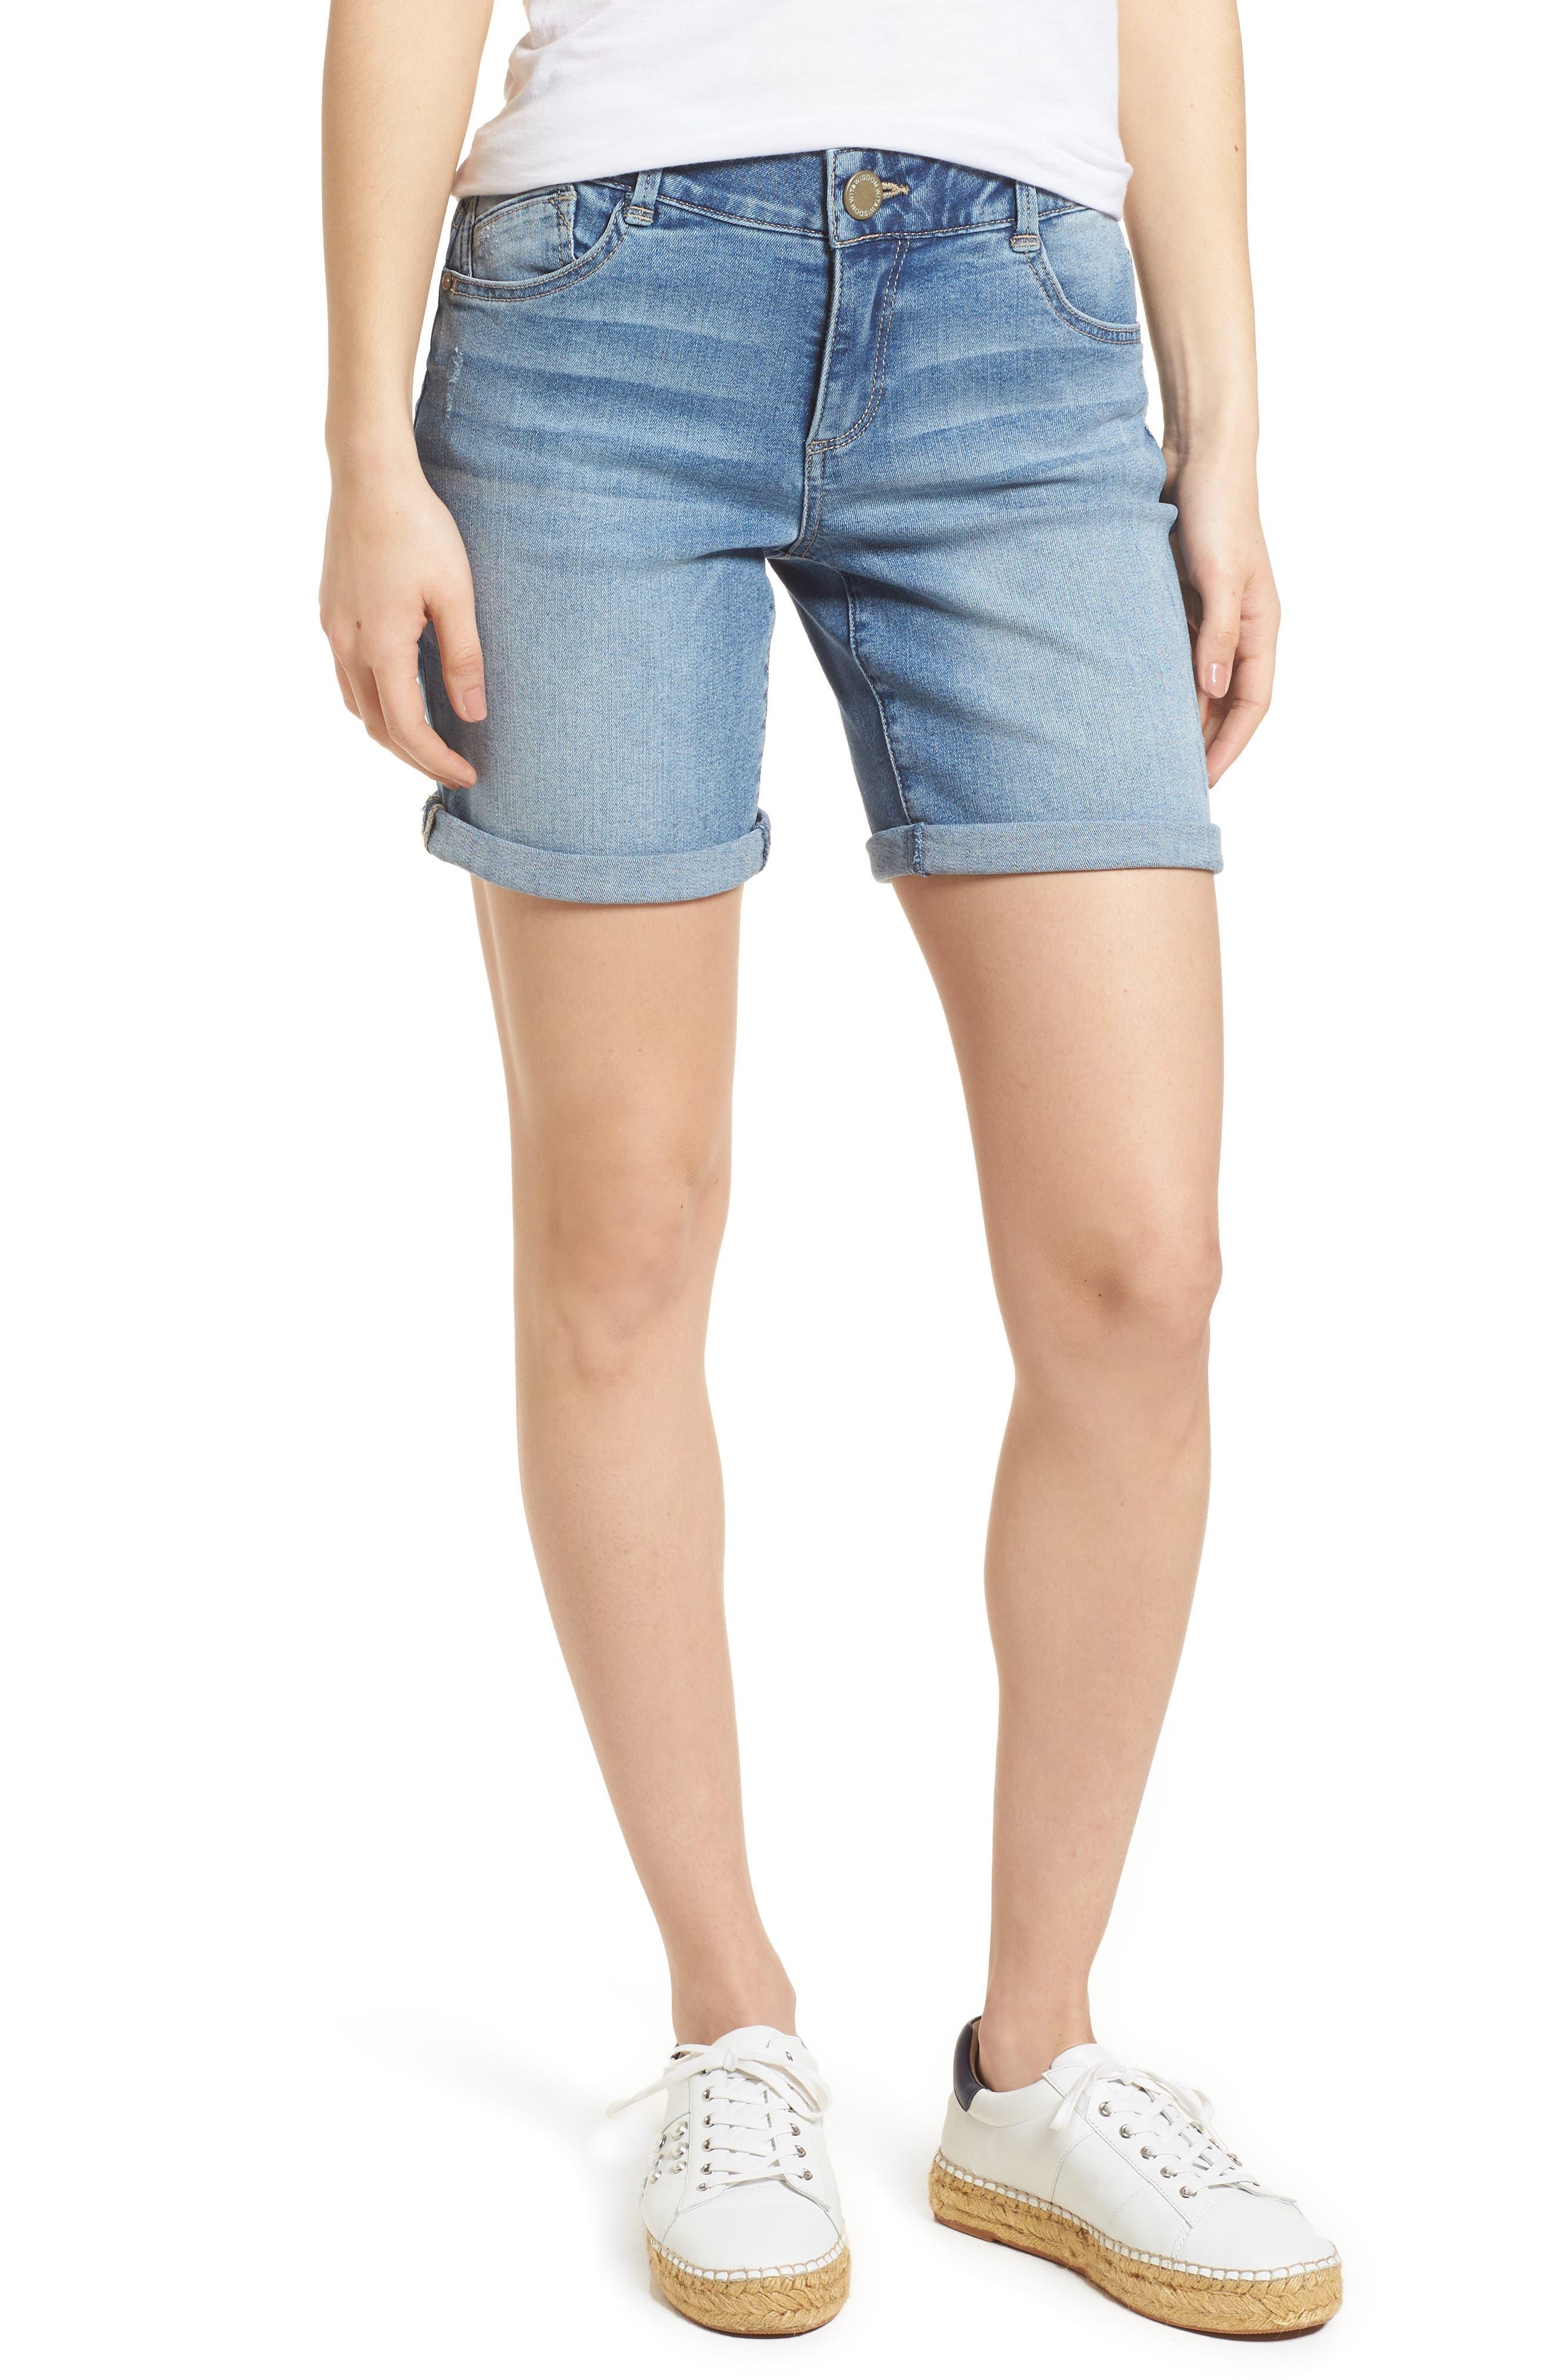 Ab-solution Denim Bermuda Shorts,                             Main thumbnail 1, color,                             Light Blue